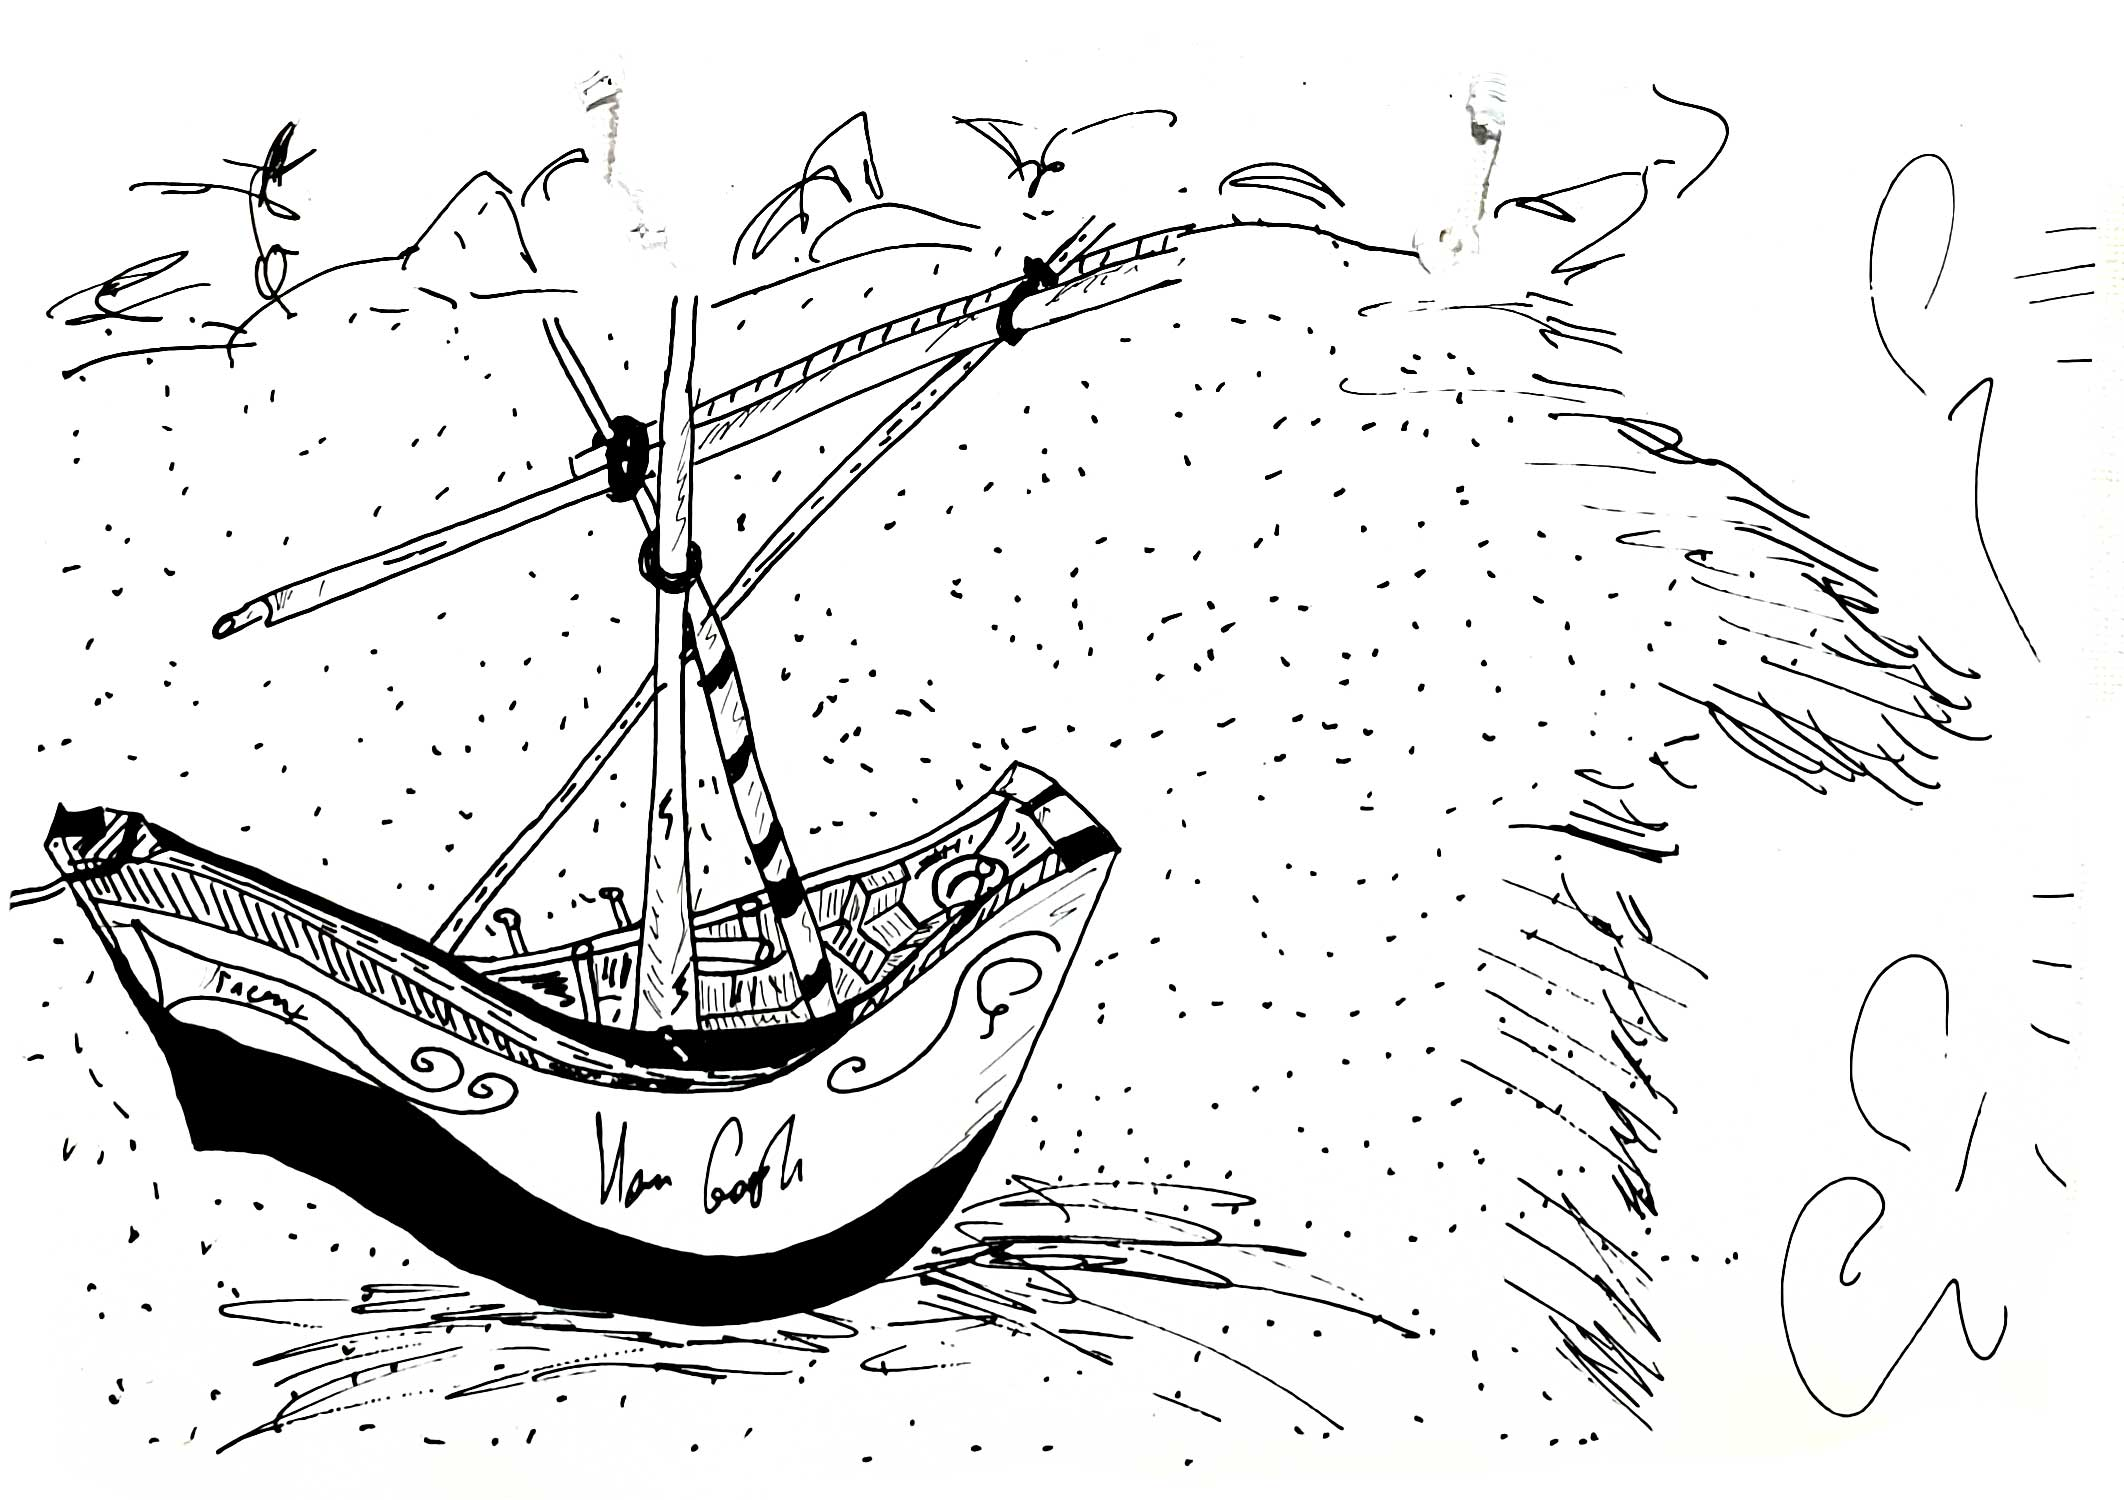 VanGogh-boat